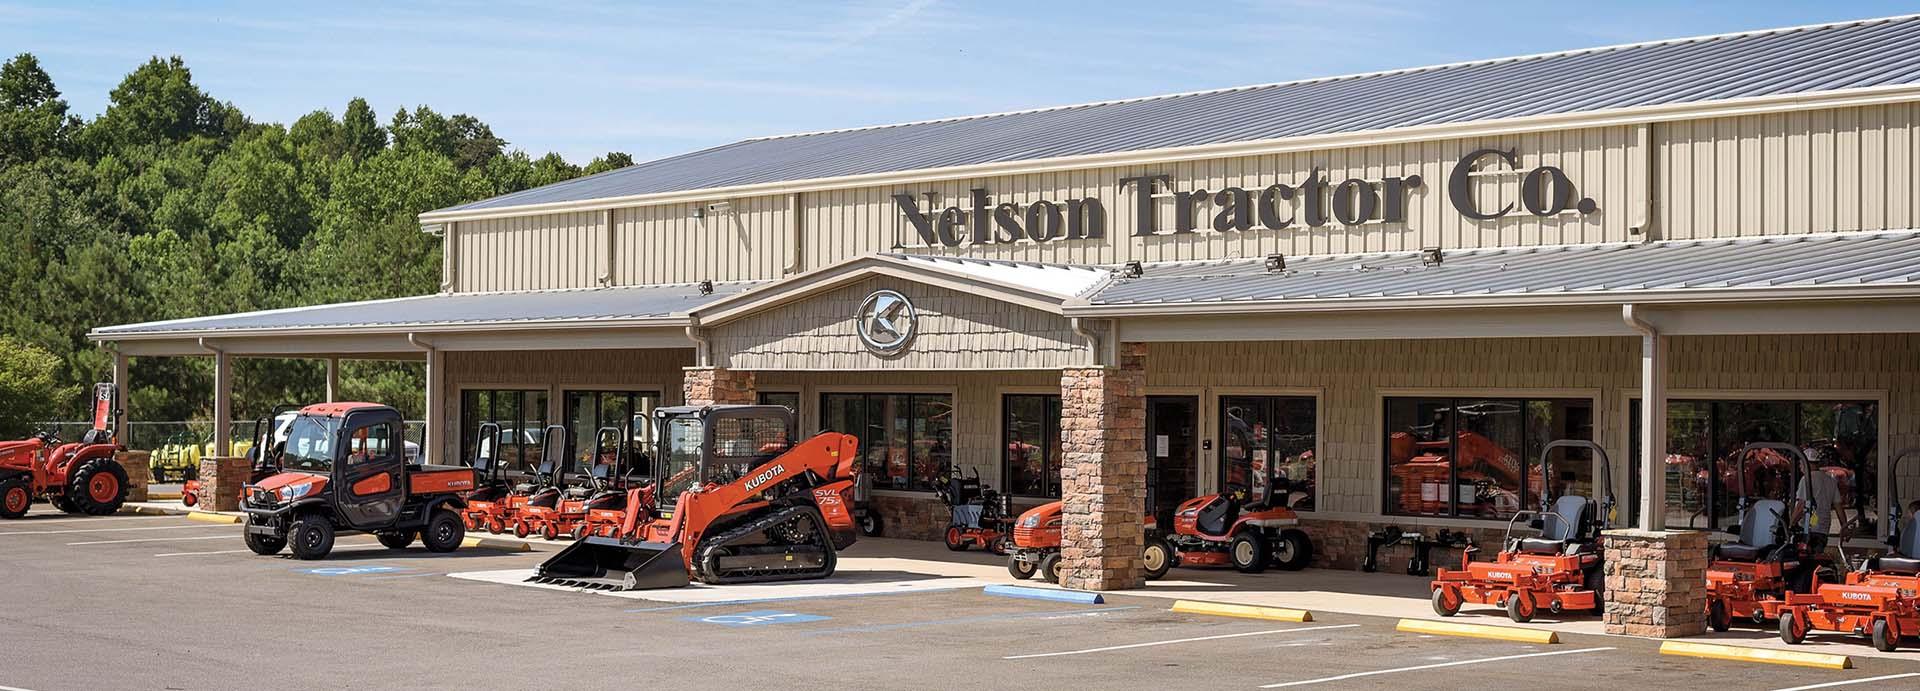 Nelson Tractor Company Storefront, Jasper Georgia